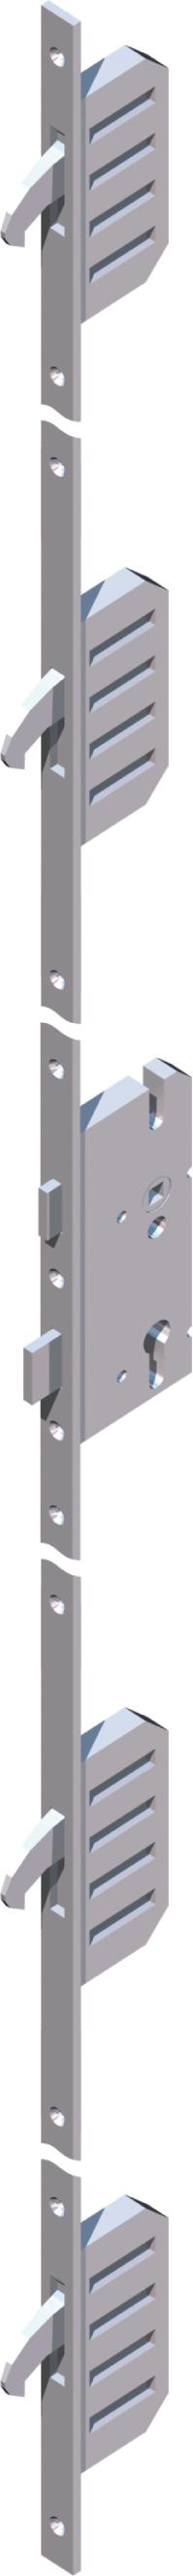 NebeneingangstUr Holz 5 Fach Verriegelung ~ fach verriegelung mit stabilen schwenkriegeln 3 fach verriegelung